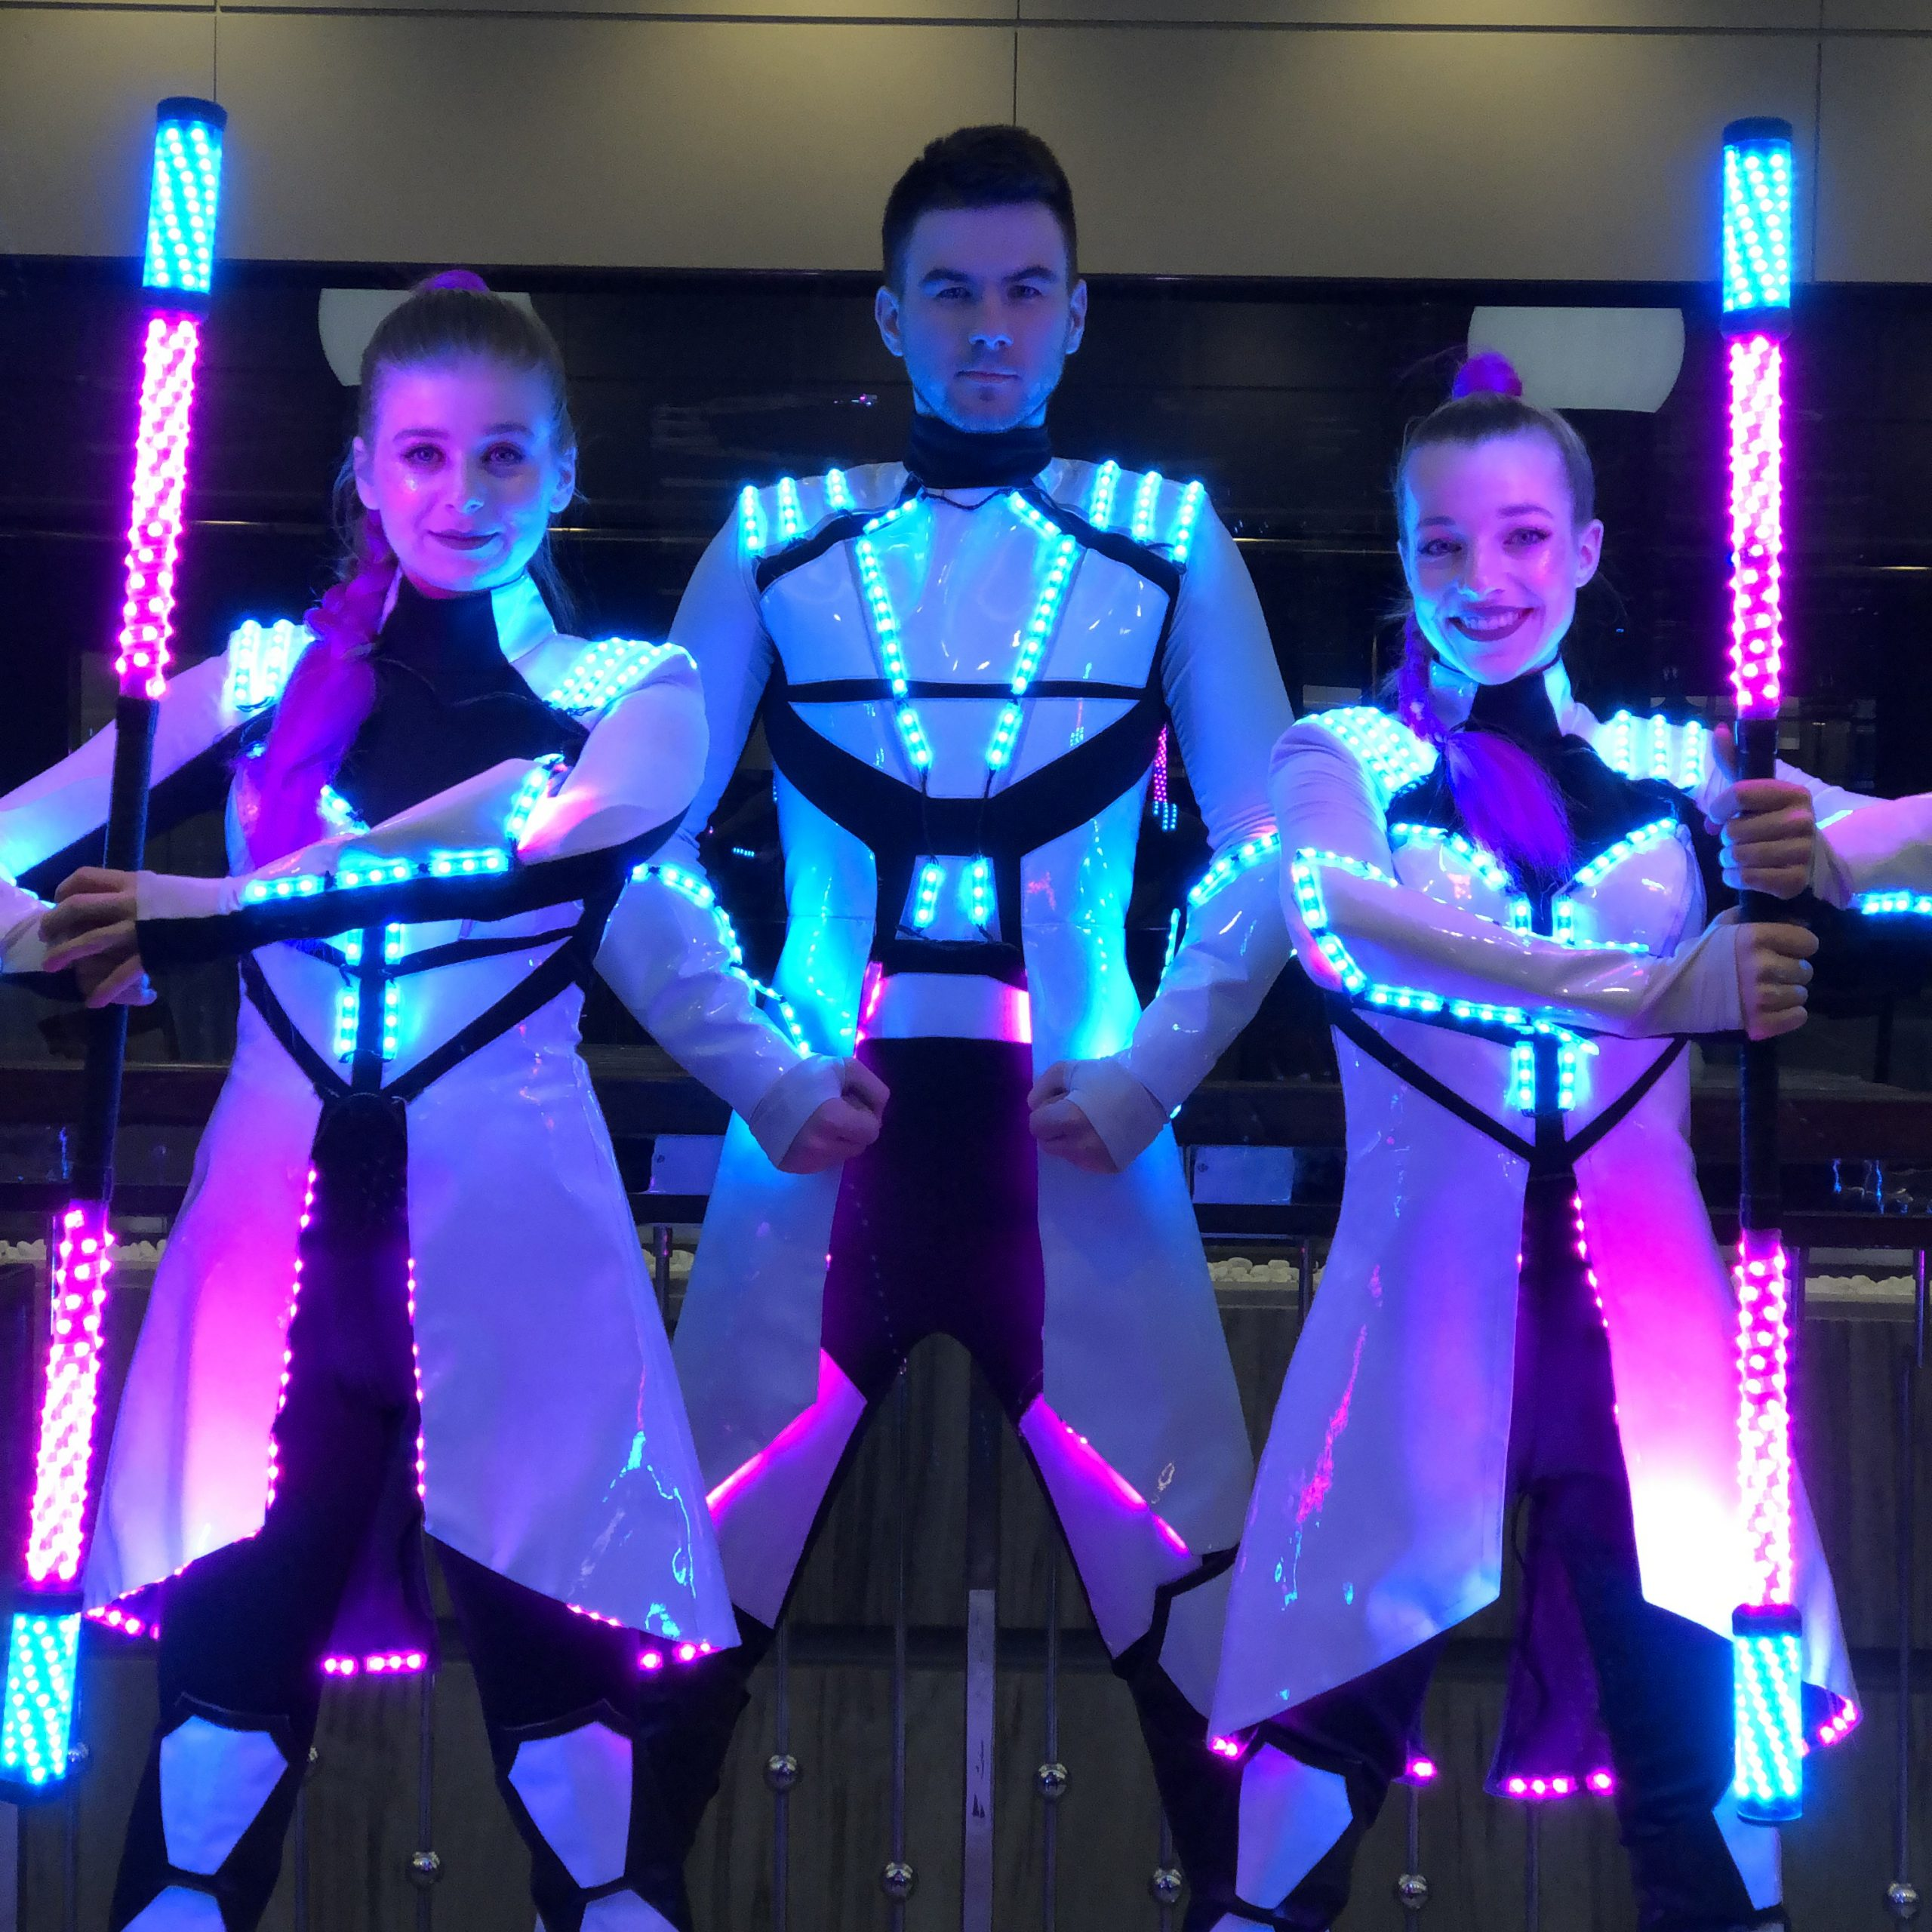 Lumination_bílé_futuristické kostýmy